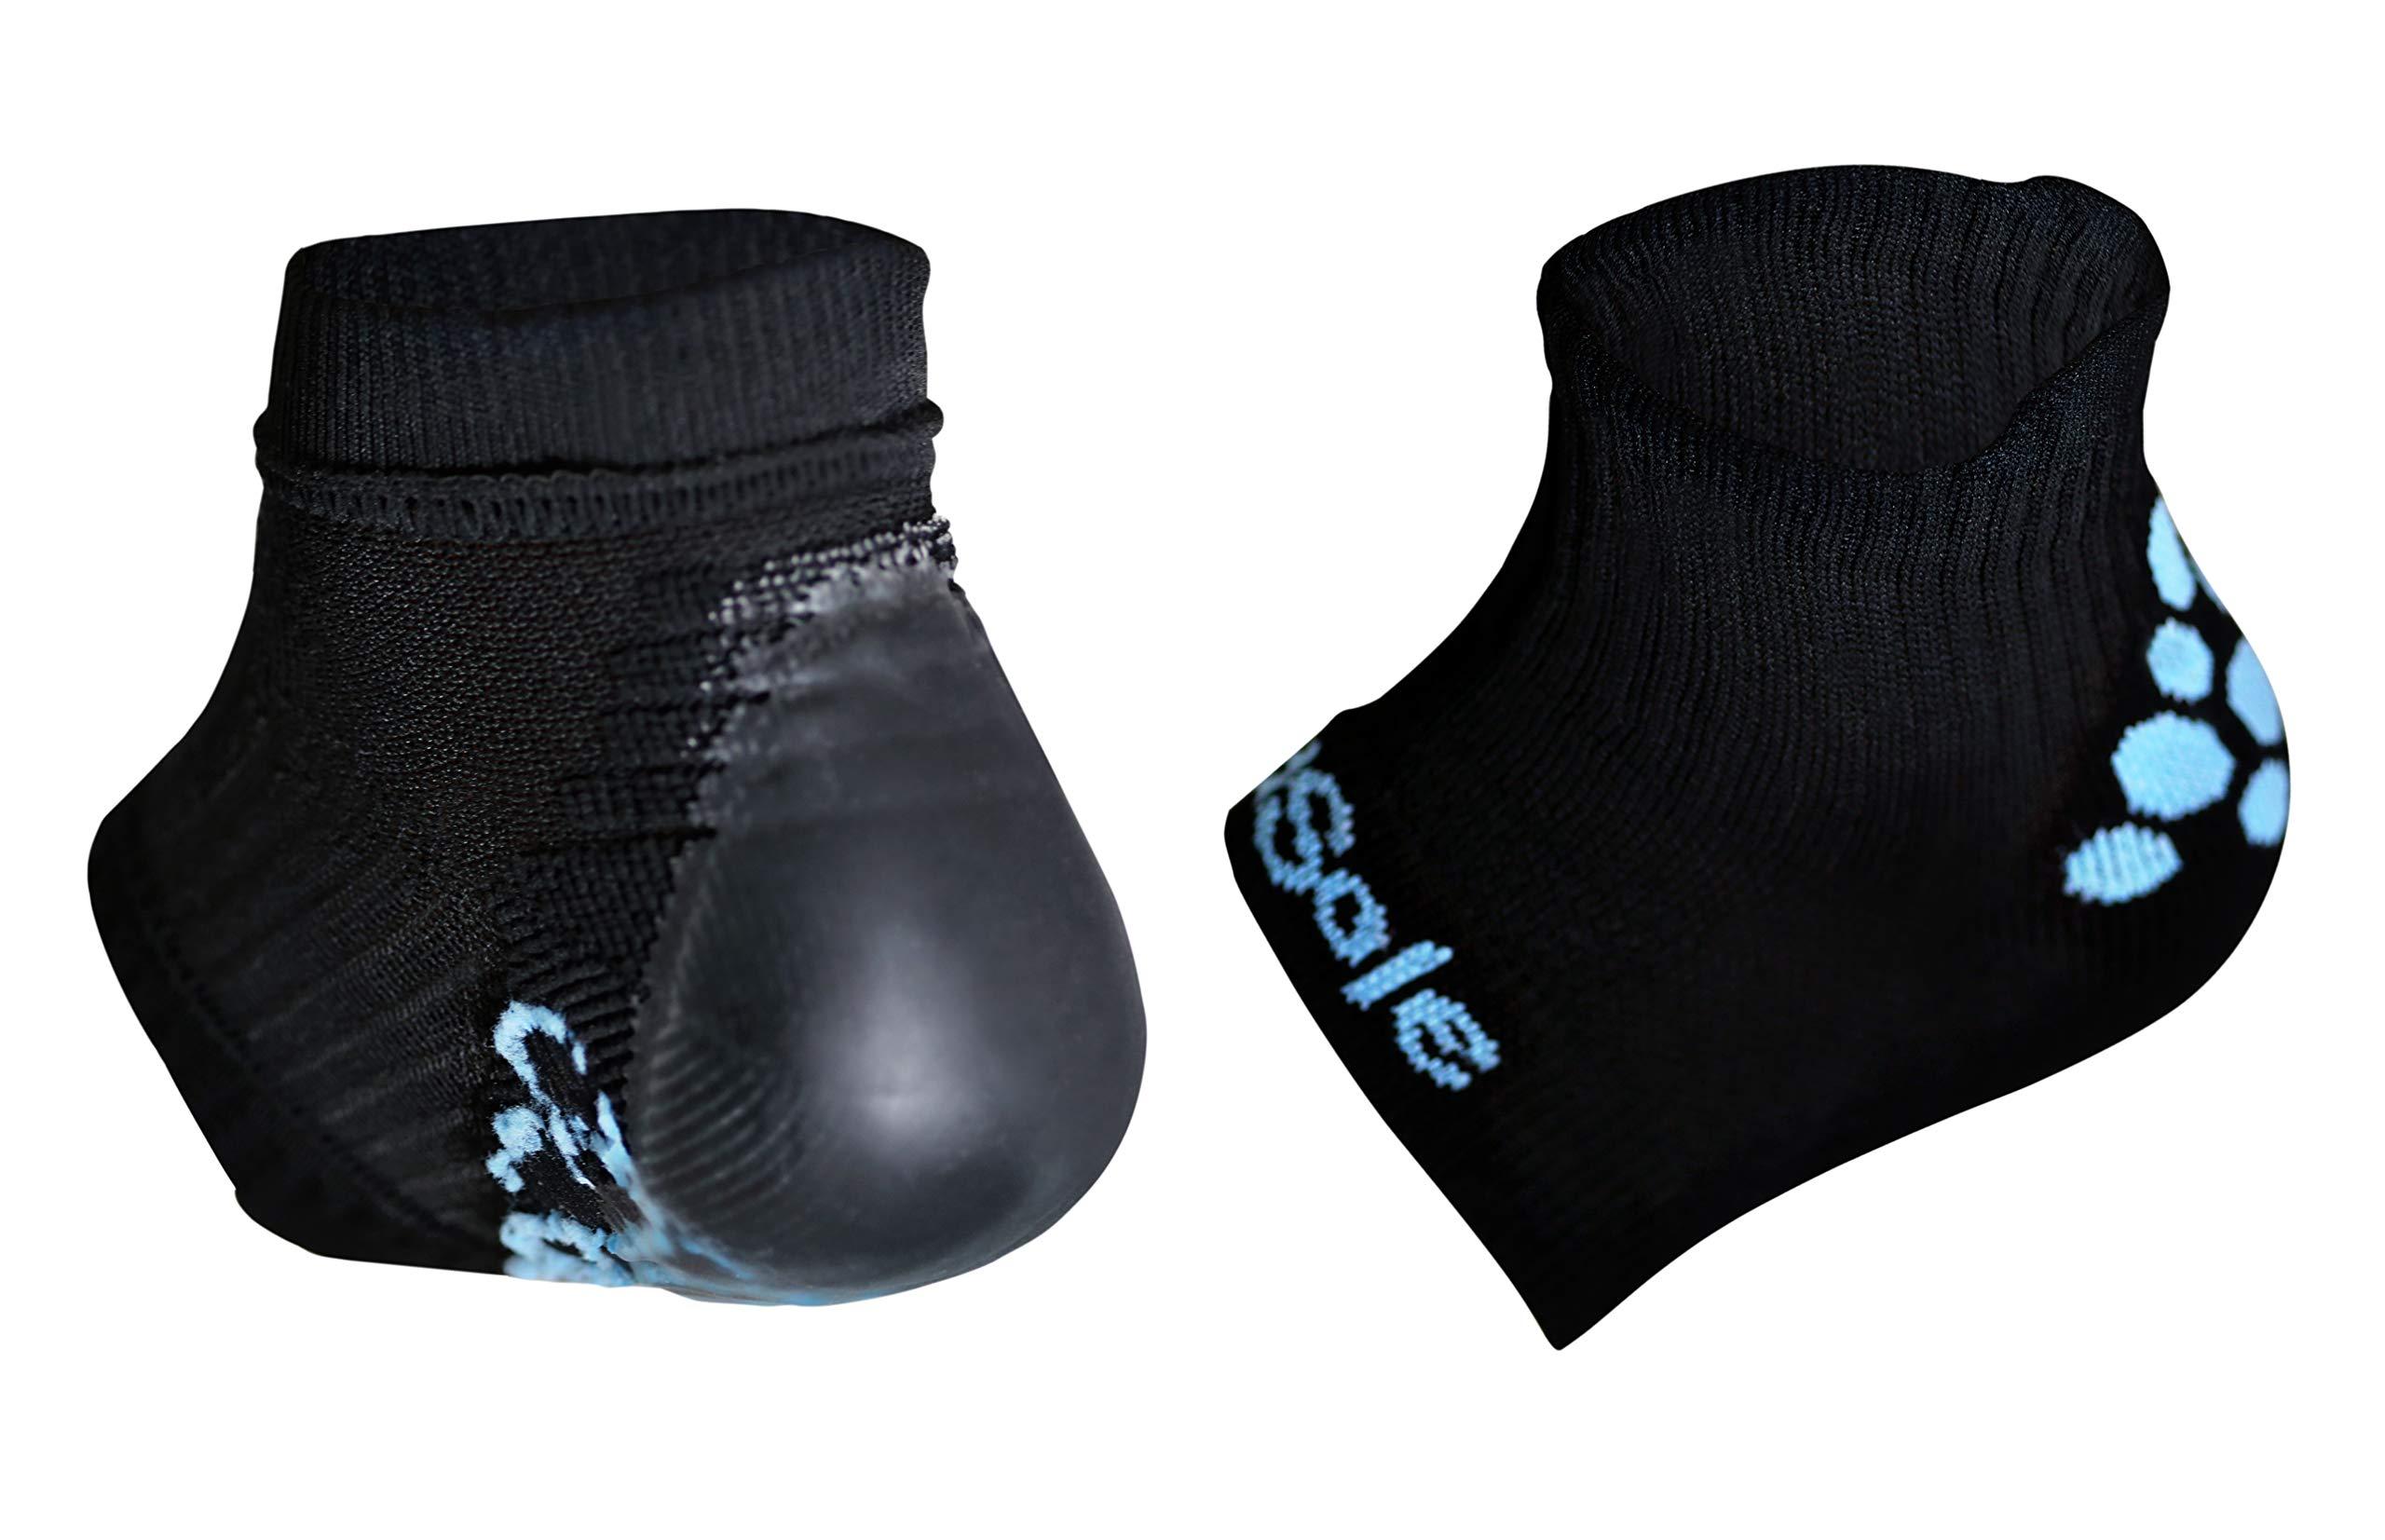 KidSole RX Gel Sports Sock for Kids with Heel Sensitivity from Severs Disease, Plantar Fasciitis (Kid's 2-7, Black) by KidSole